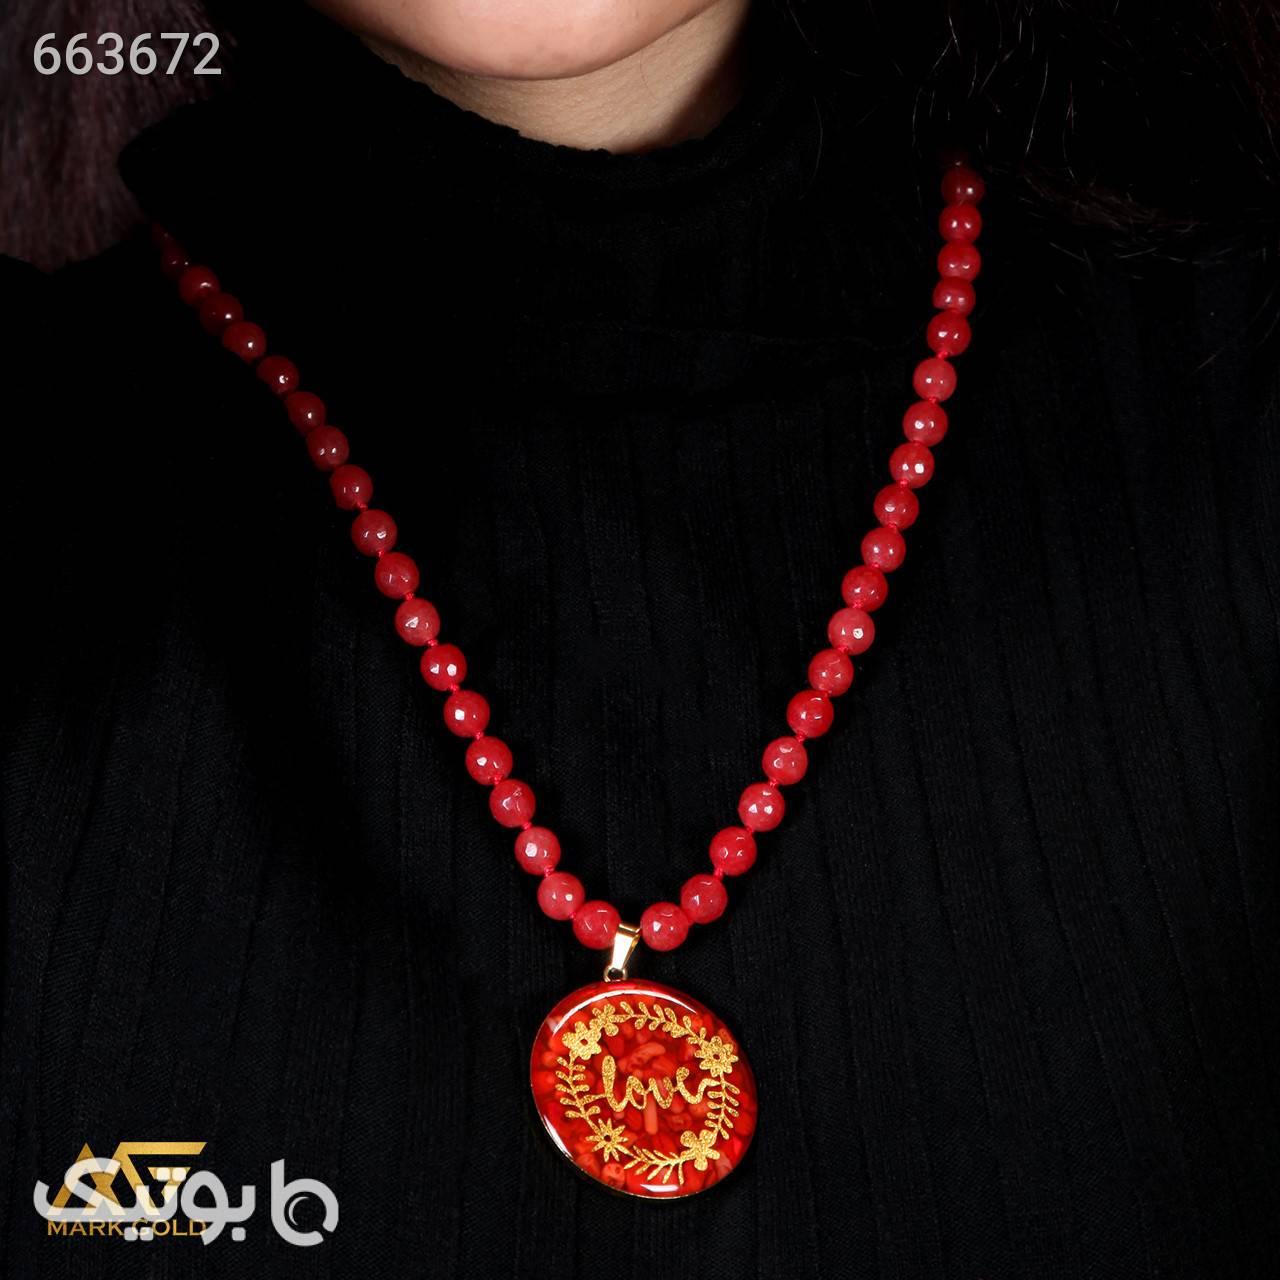 GN3051 گردنبند روکش طلا طرح Love قرمز گردنبند